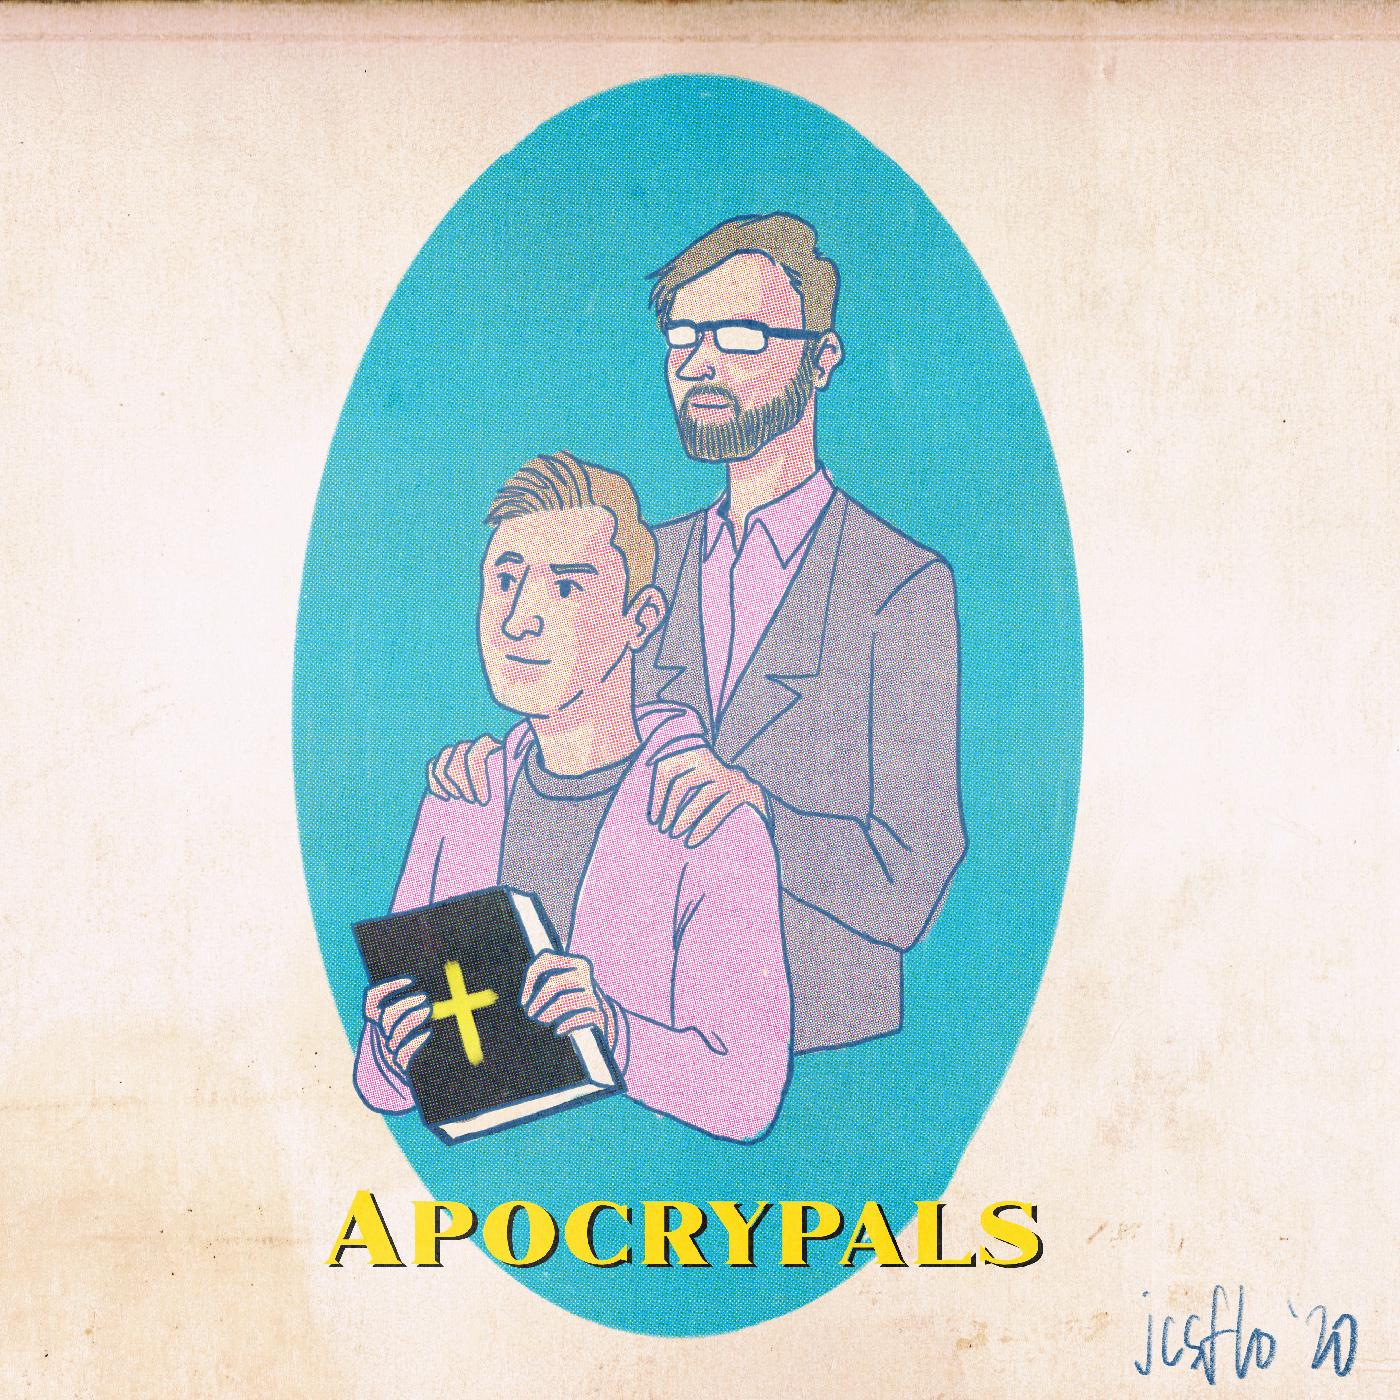 Apocrypals show art